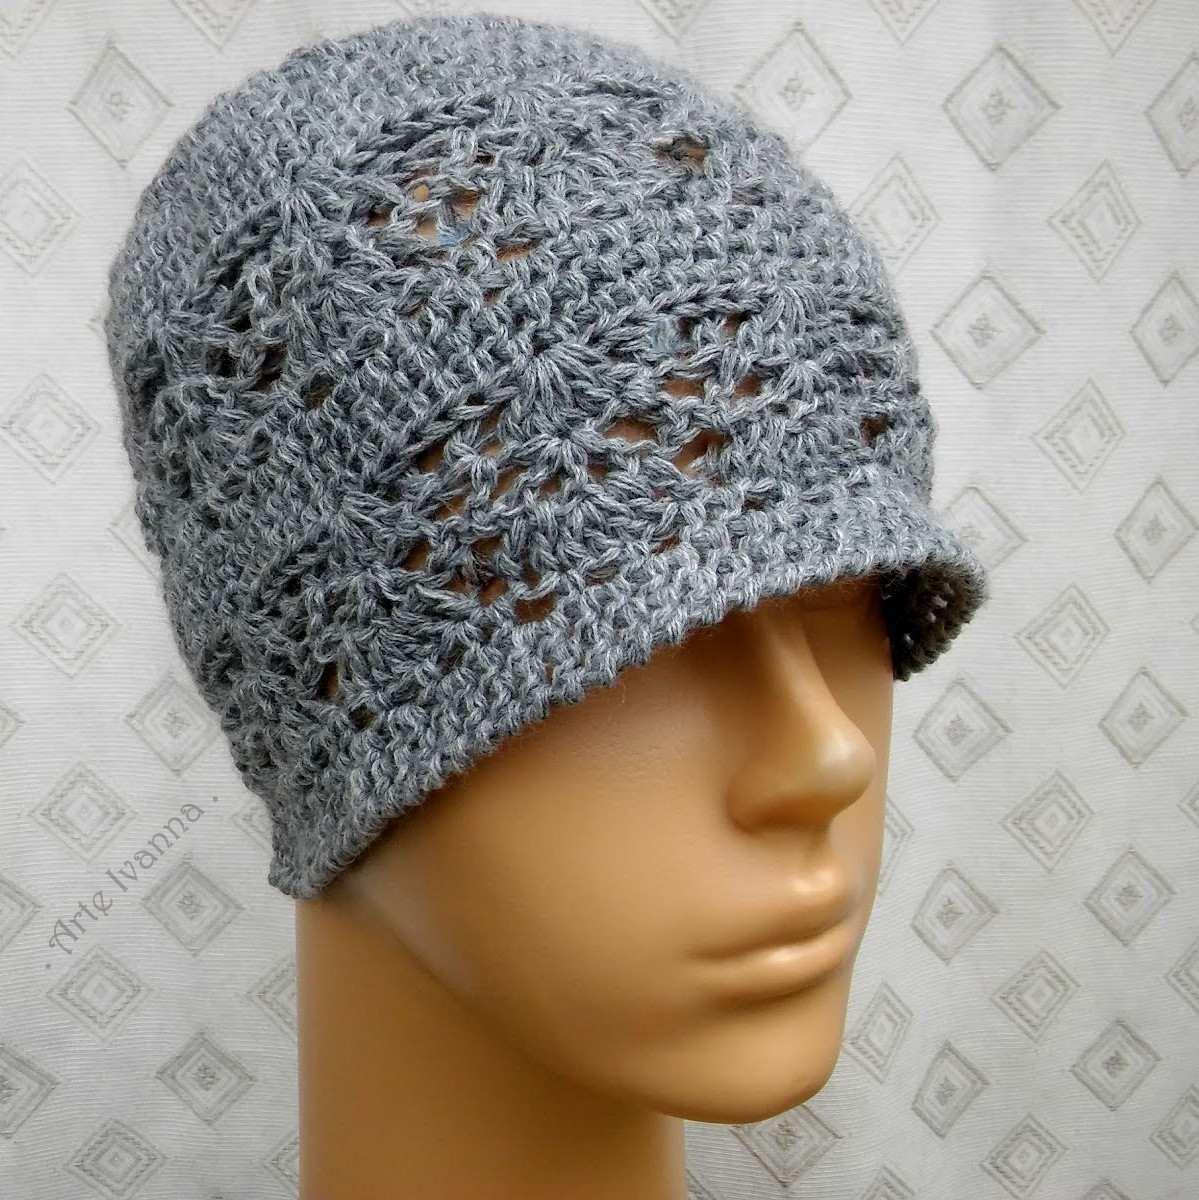 3c9ada6e90e7d gorro beanie cloche lana tejido mano crochet mujer lady gray. Cargando zoom.